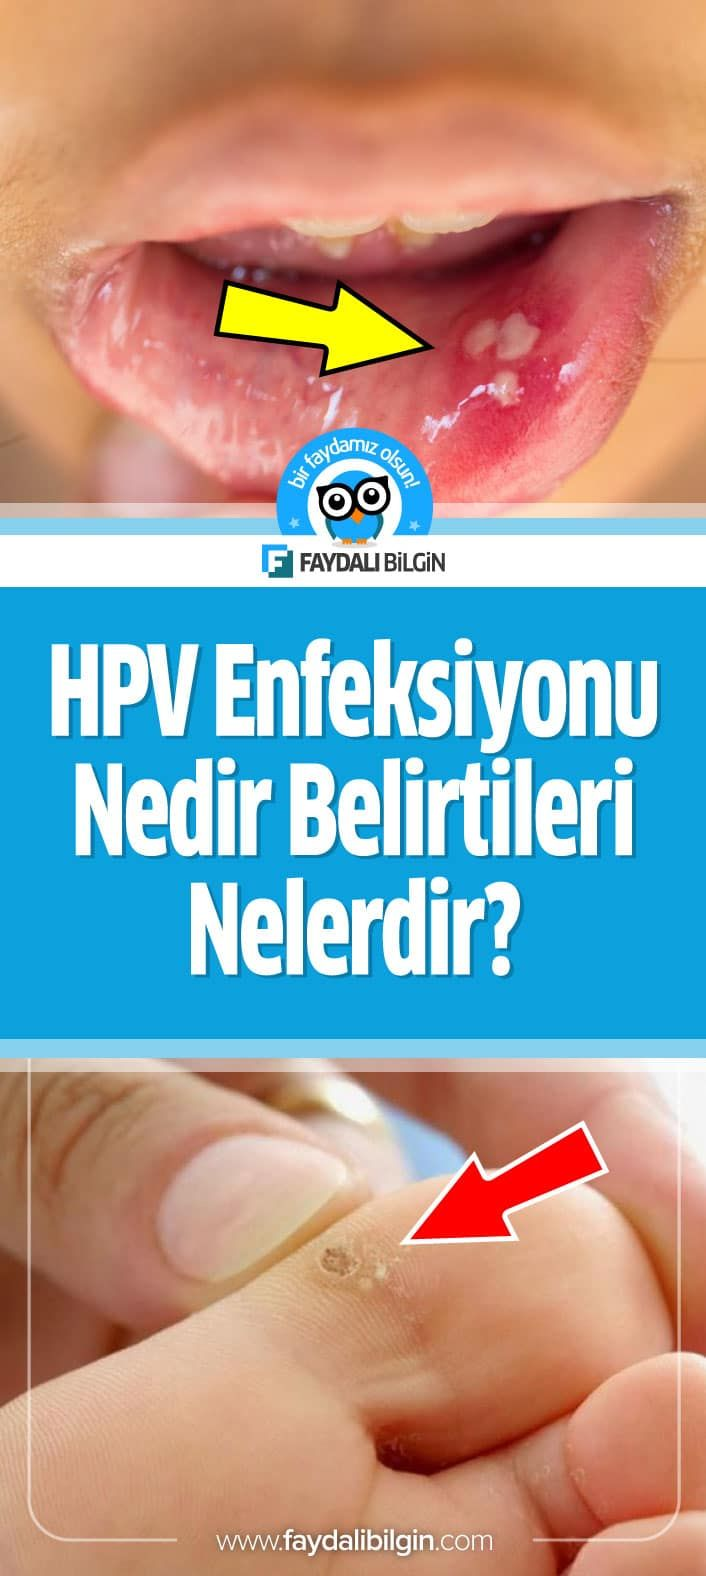 hpv genital sigil as s